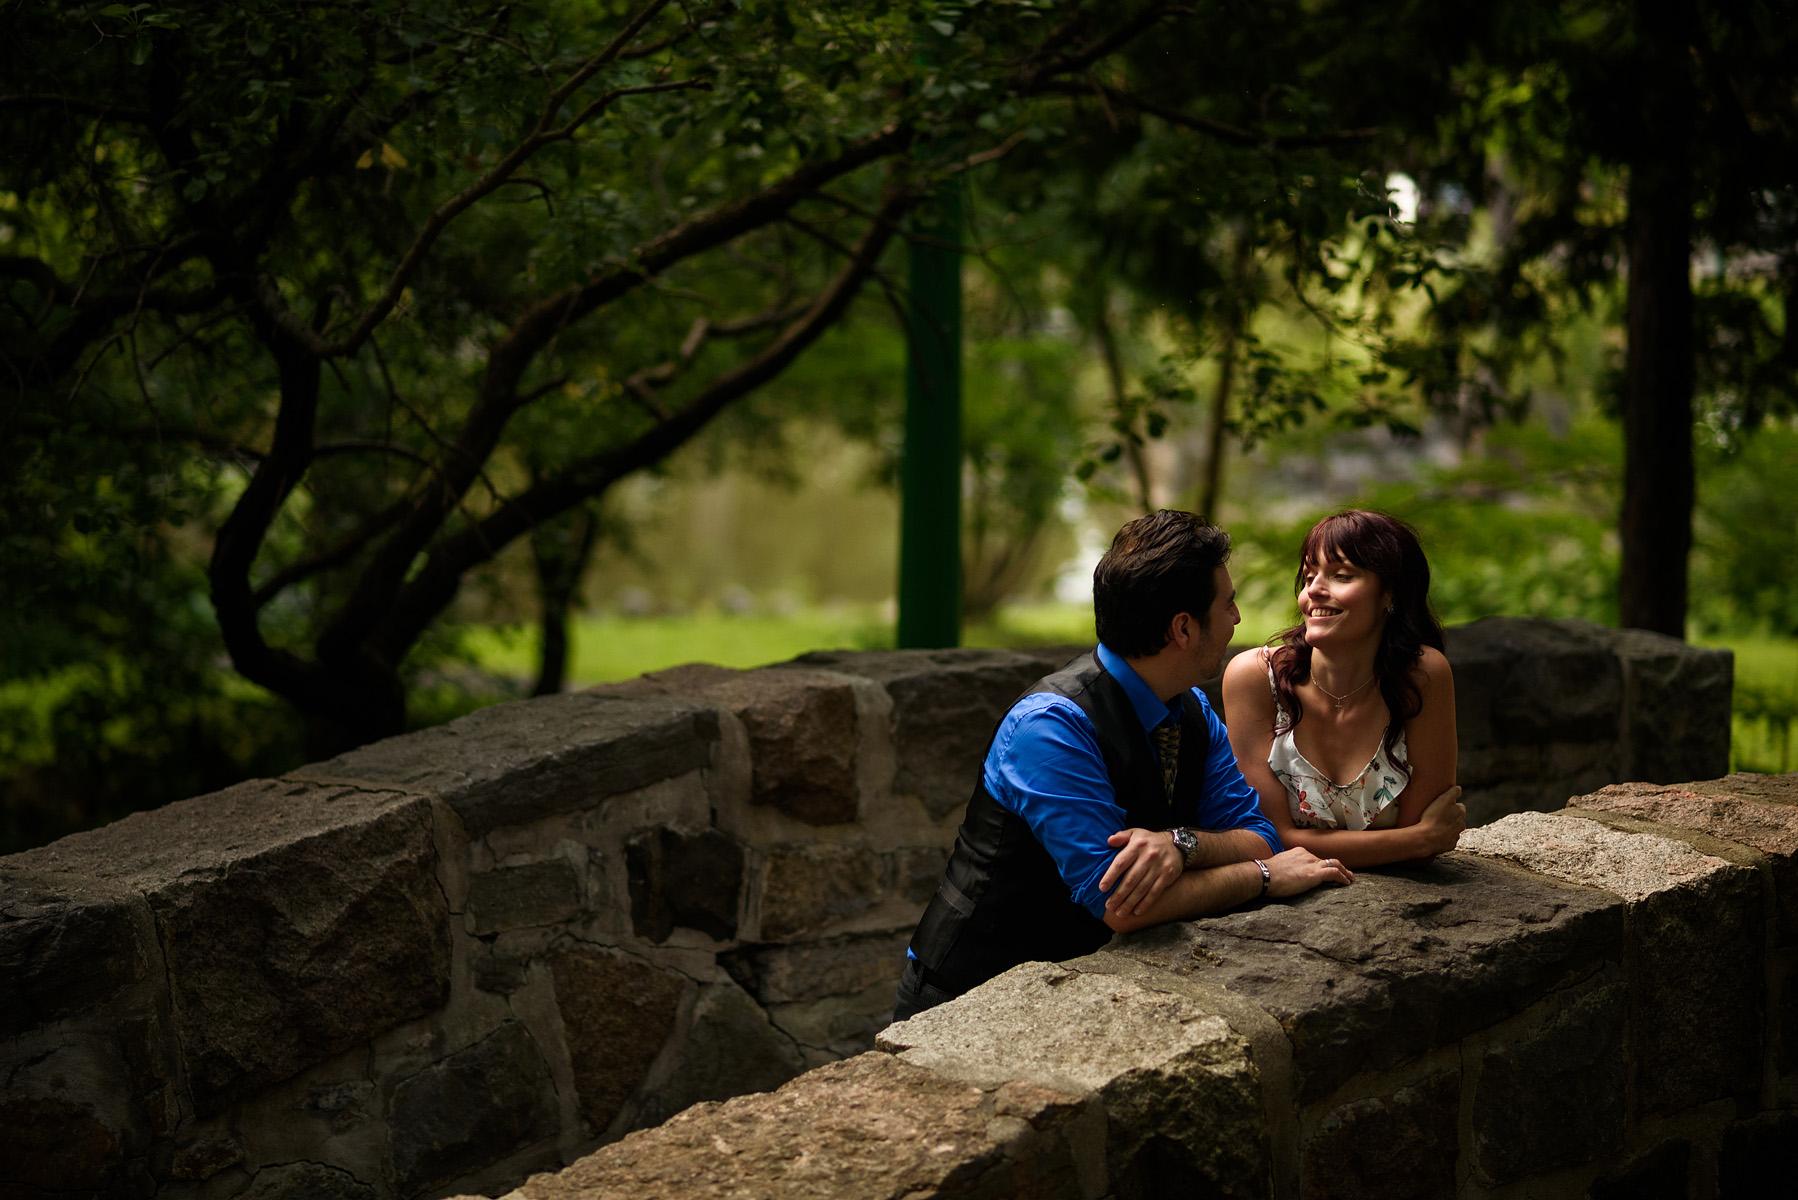 francisco-genevieve-couple-27.jpg